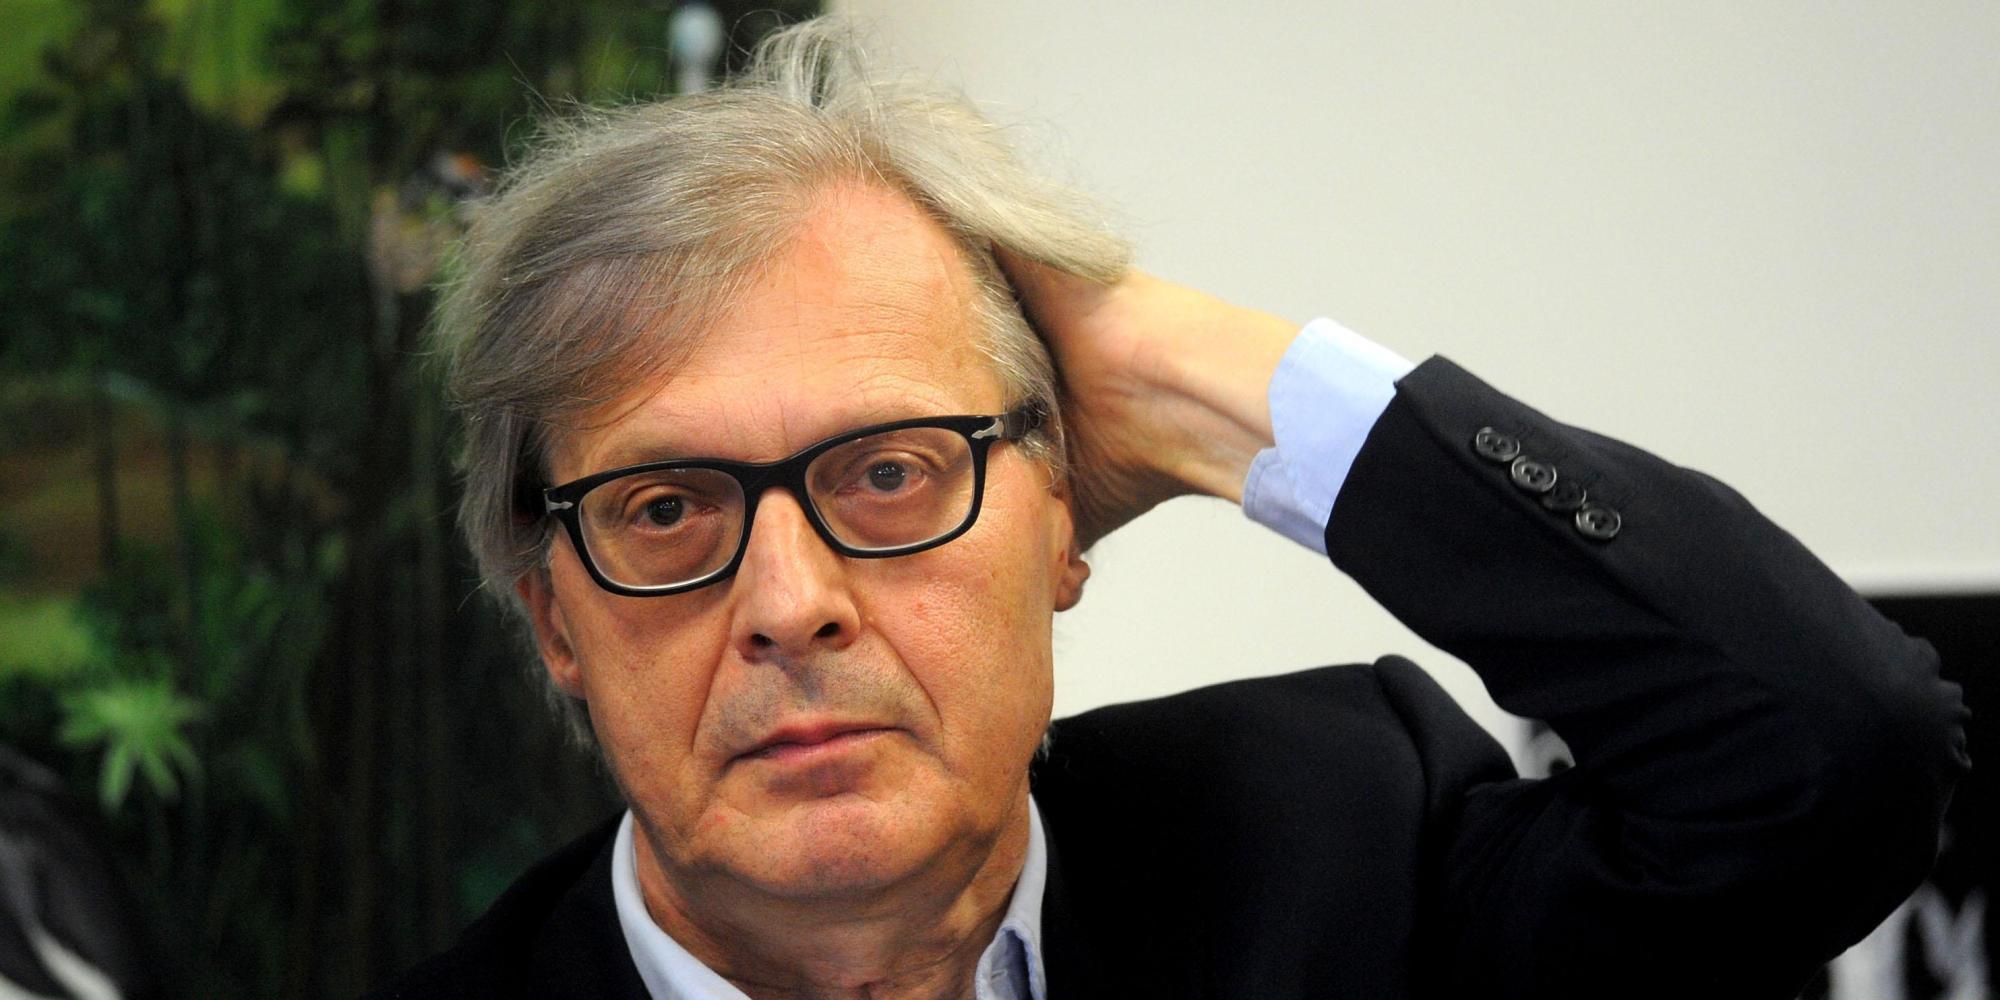 Vittorio Sgarbi critica compagnia Swissair su Facebook